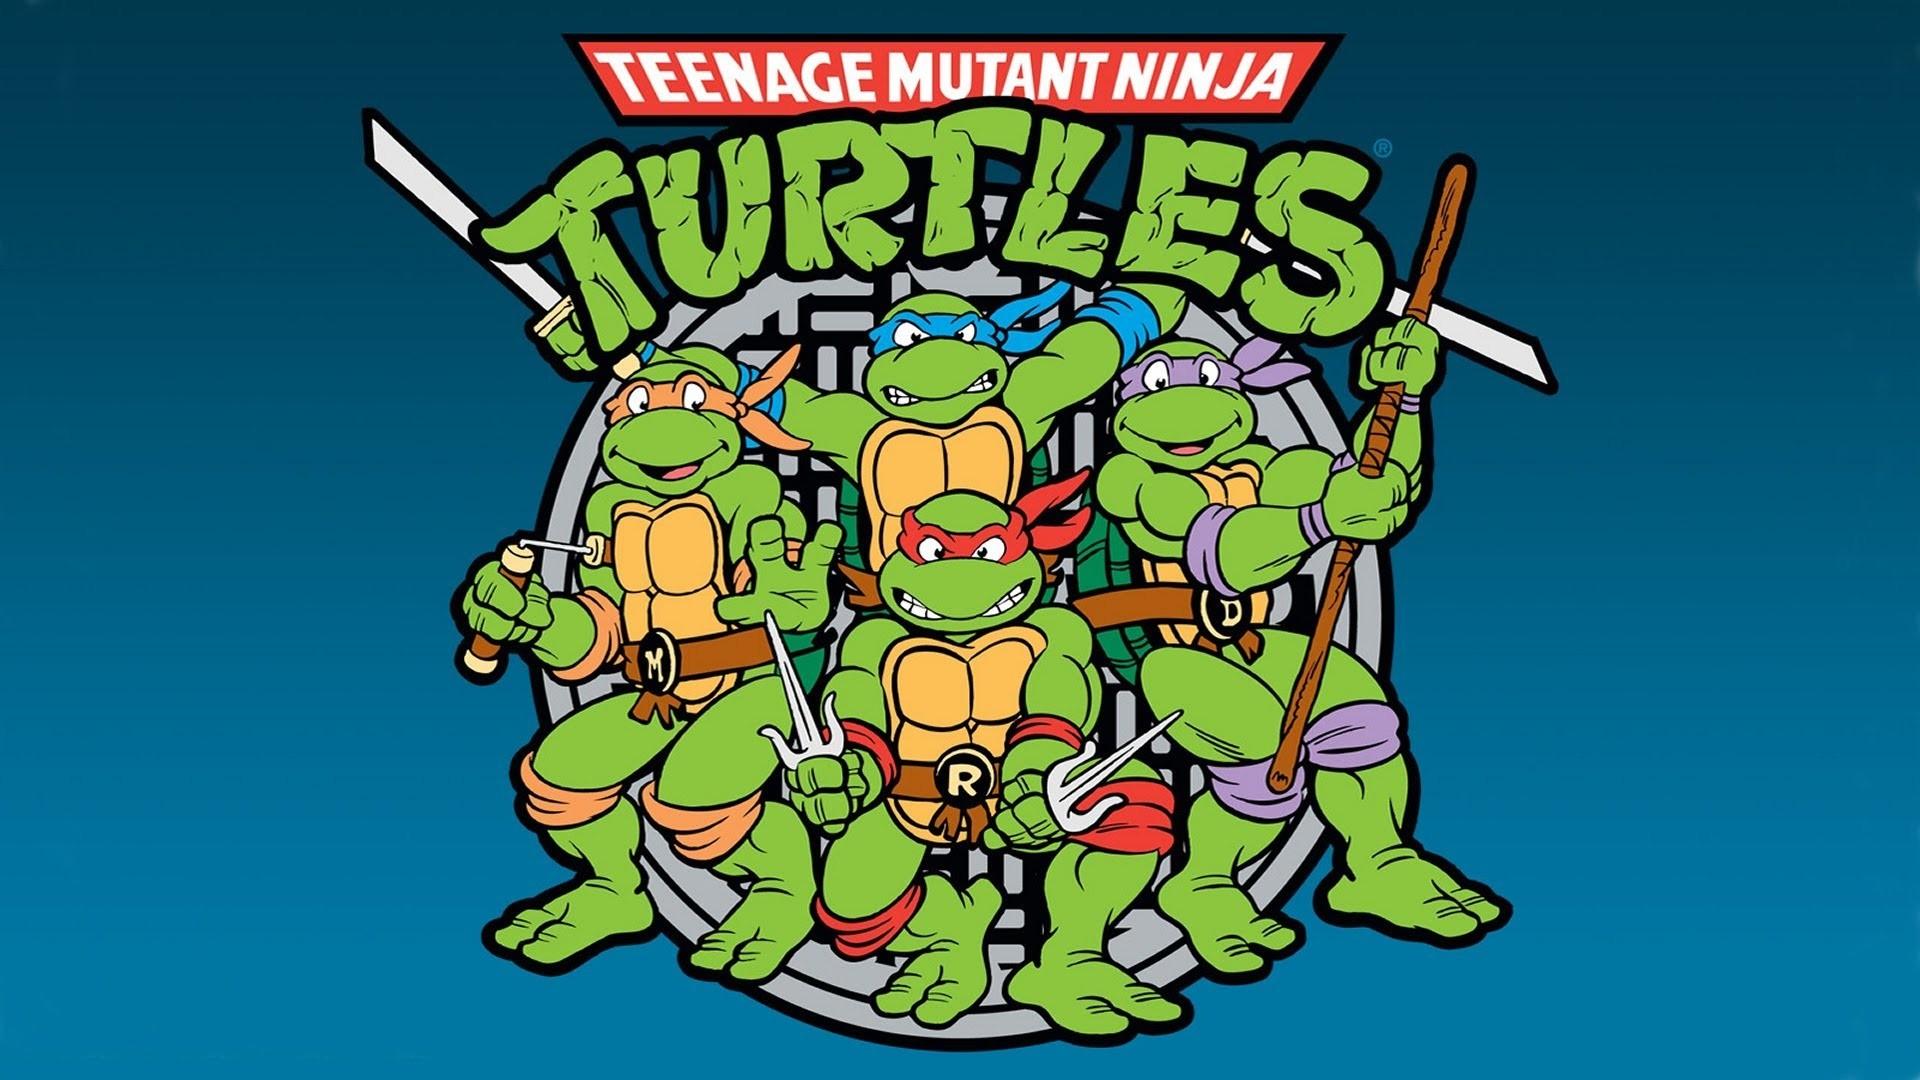 1920x1080 Rise Of The Teenage Mutant Ninja Turtles Nickelodeon Orders New Animated Series